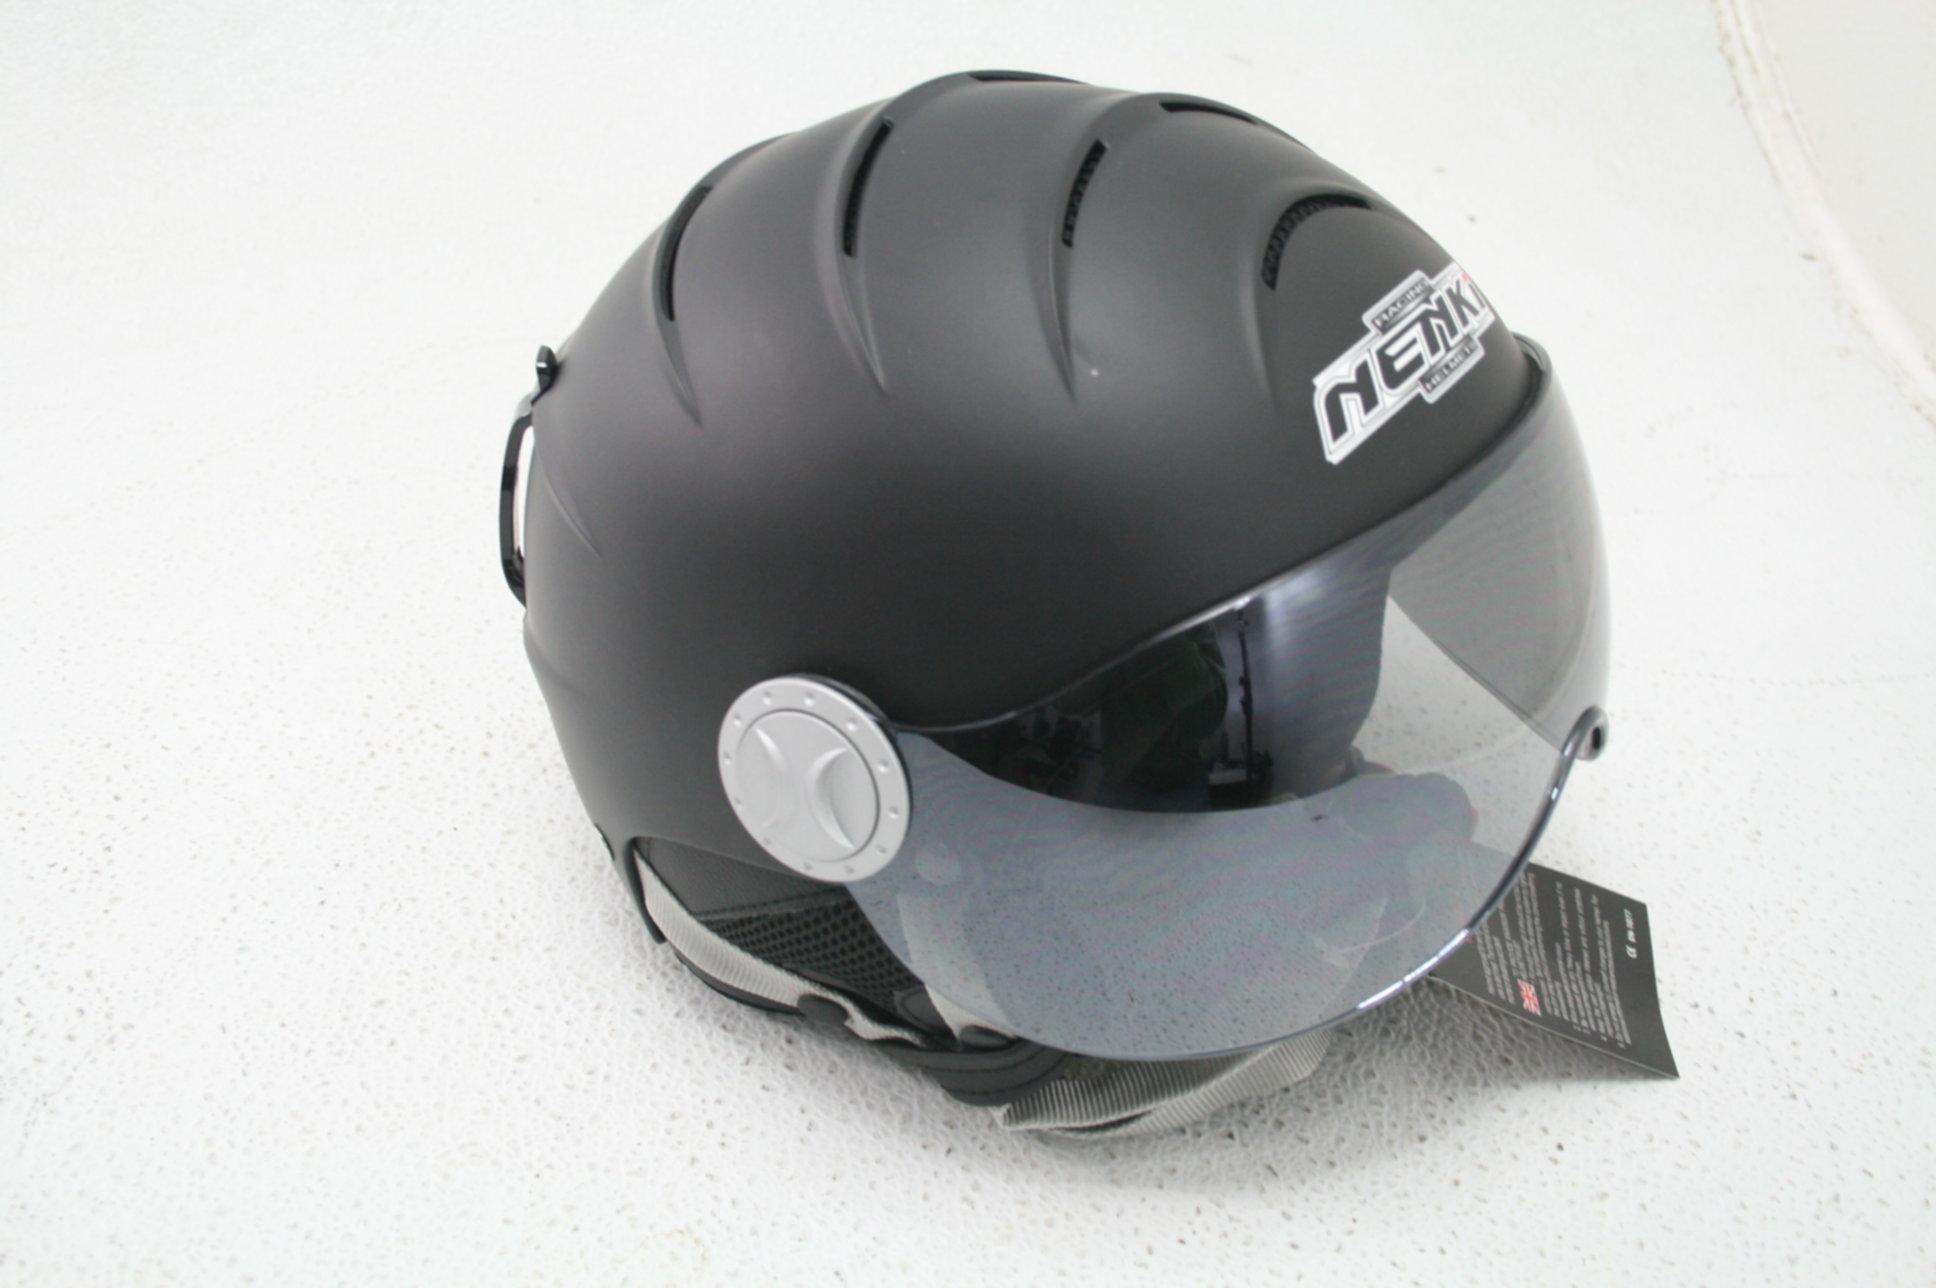 248a0f440f7 NENKI Ski Helmet with Visor Snow Sport Skiing Snowboard Helmets Men ...